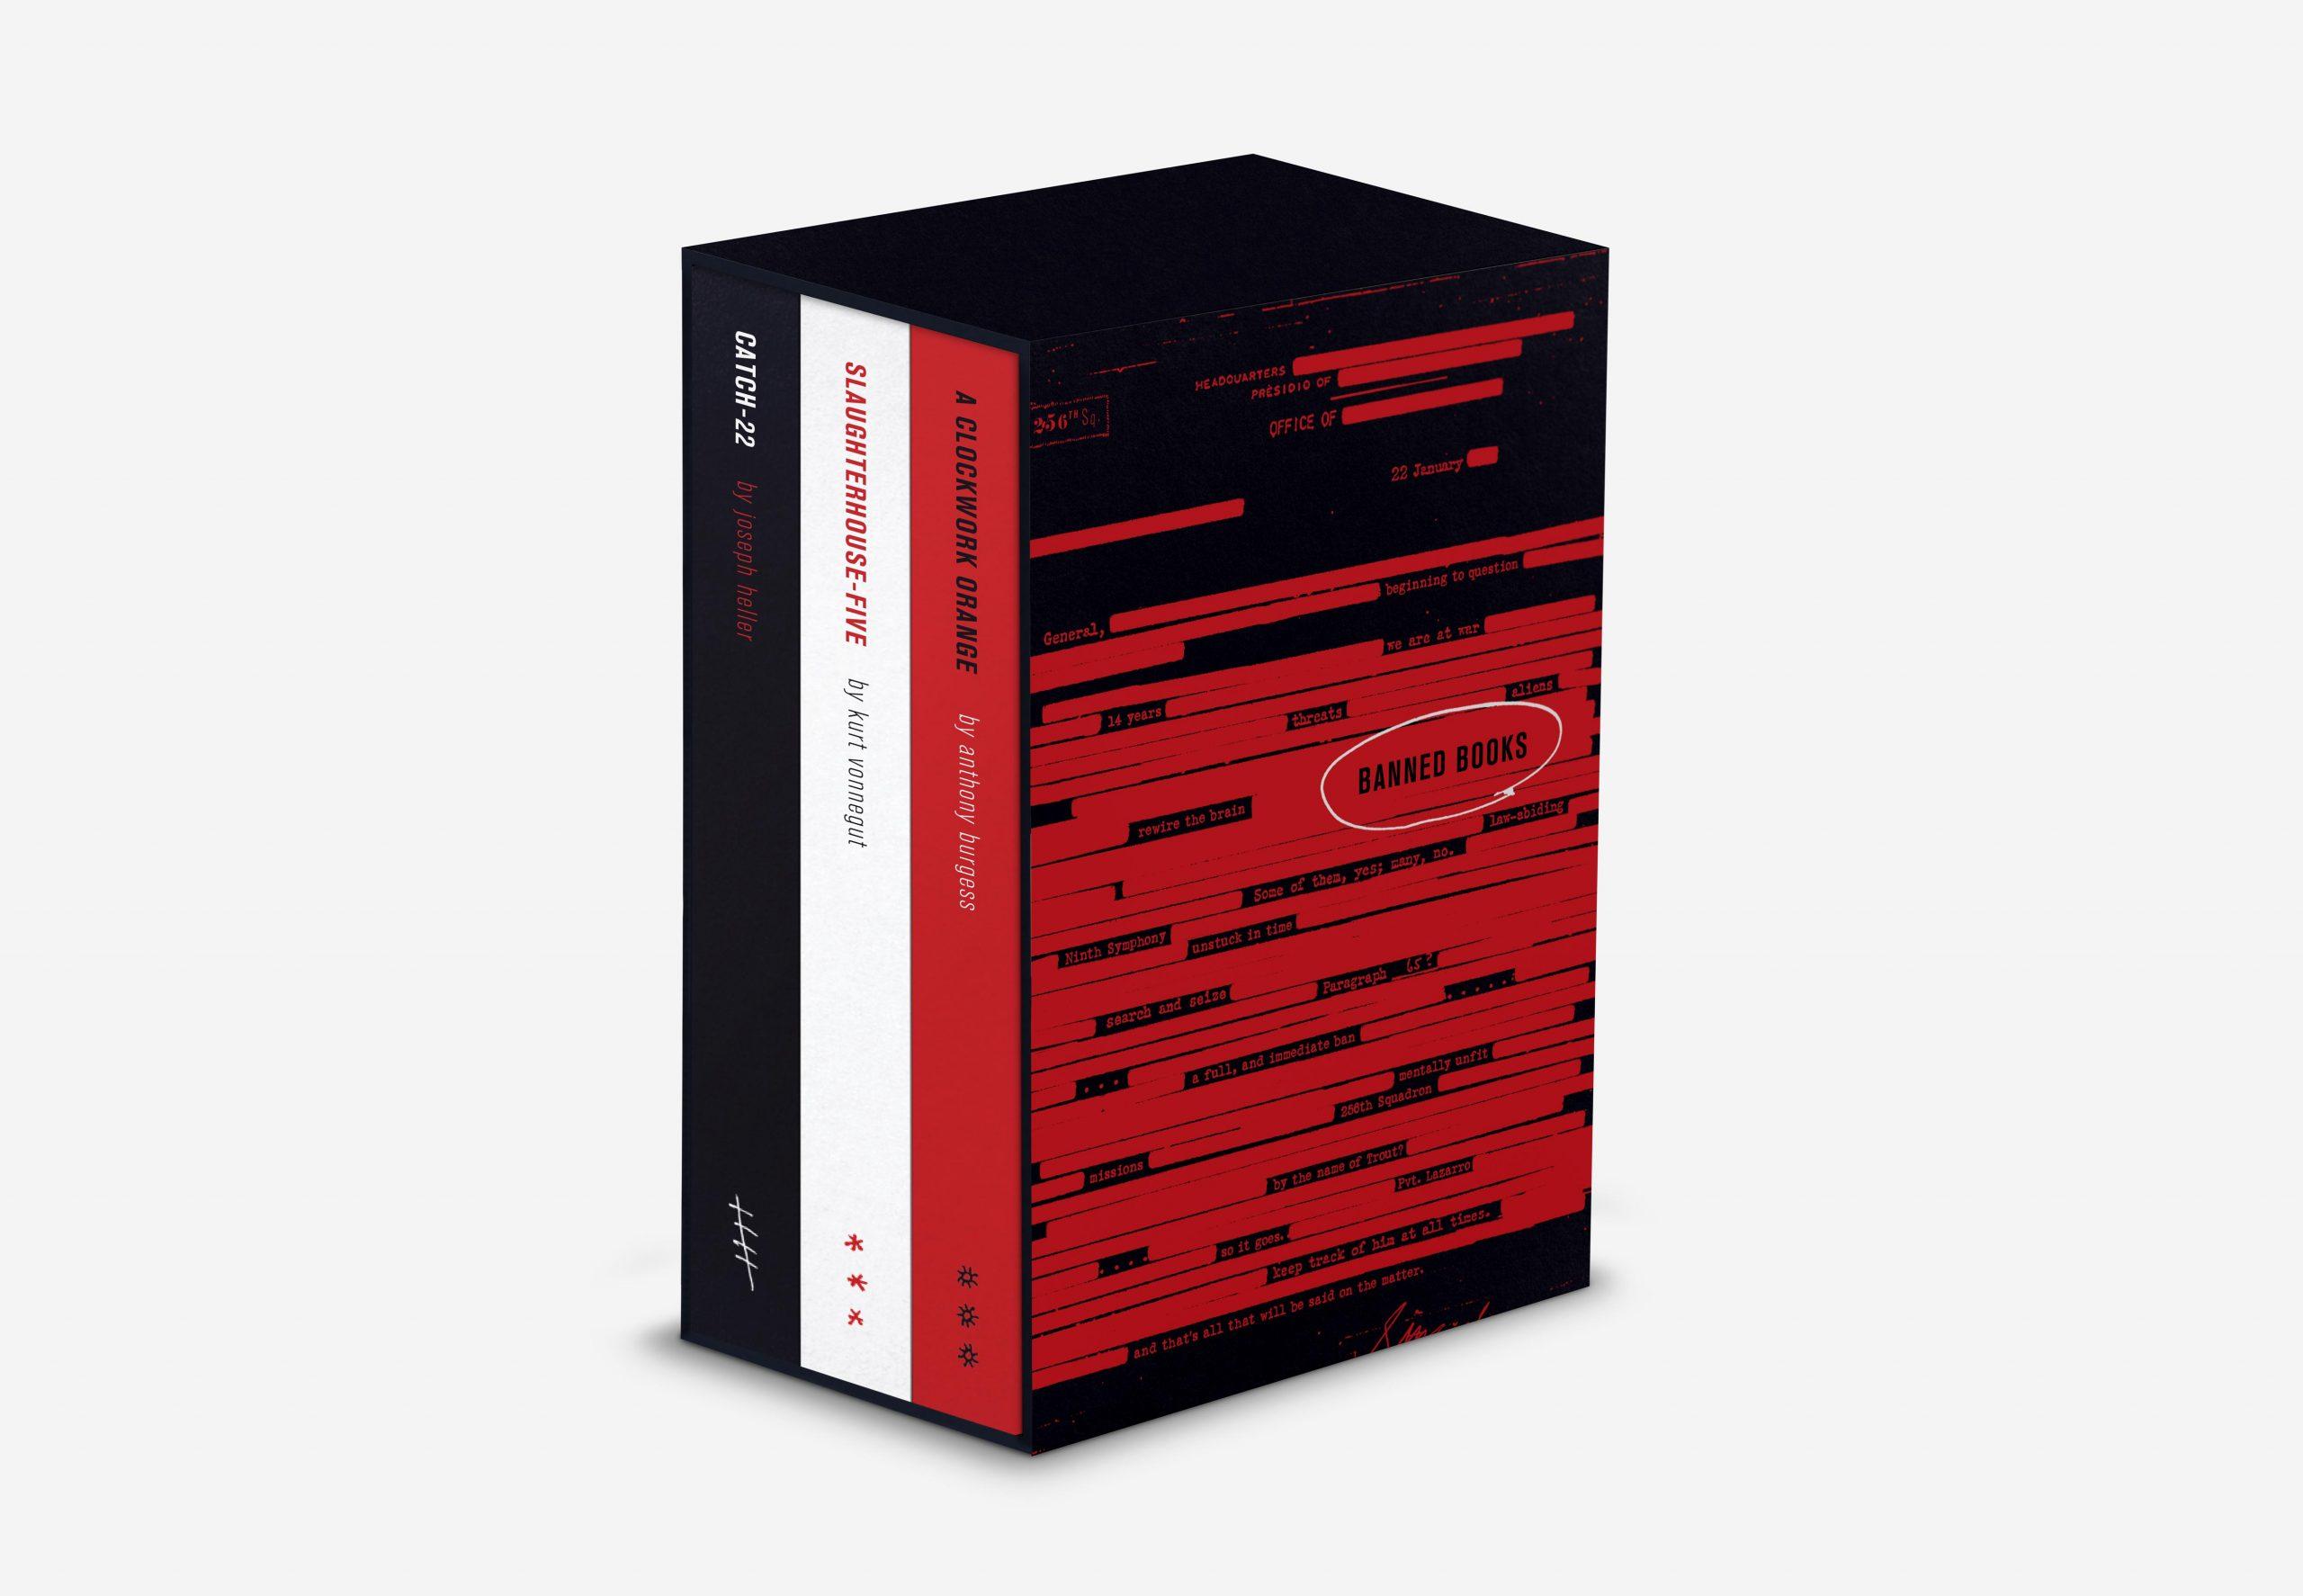 bookmockup_slipcase_2